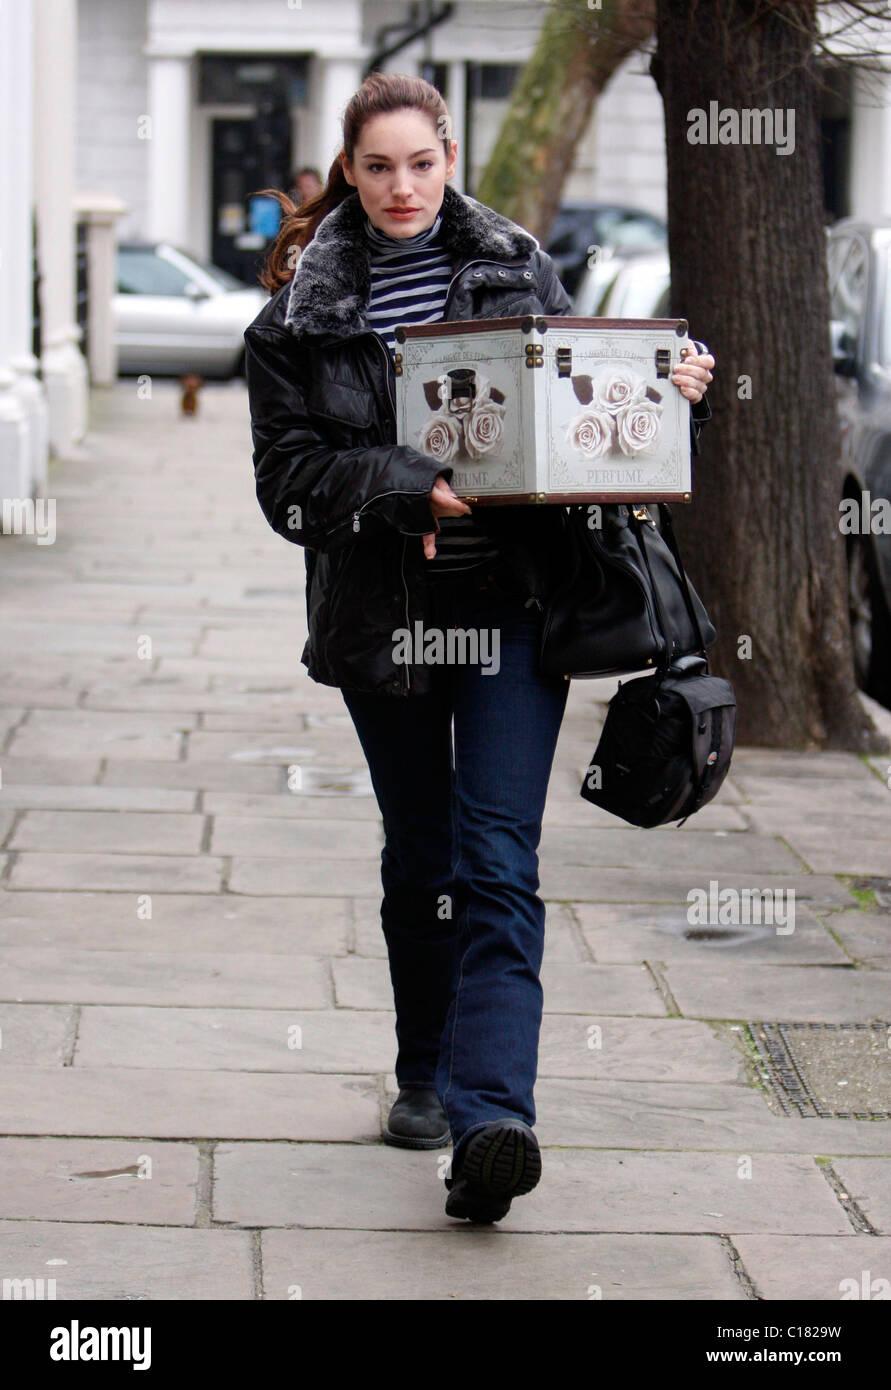 Kelly Brook salir de casa con un gran aspecto antiguo cuadro de perfume, Londres, Inglaterra - 26.02.09 Foto de stock